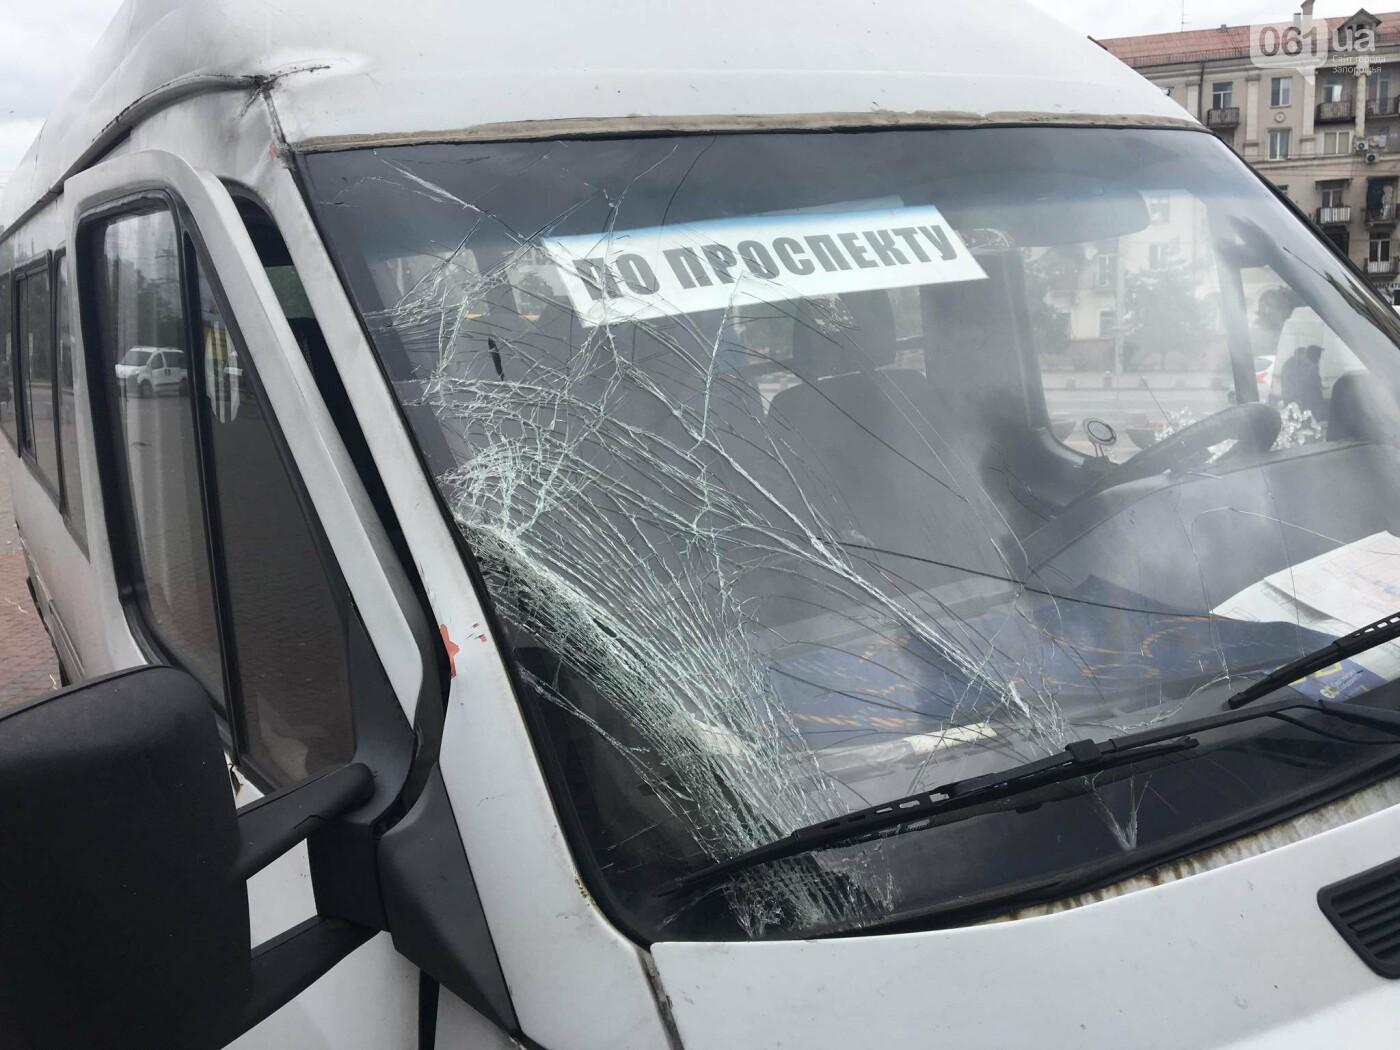 В центре Запорожья маршрутка попала в ДТП: пассажирку госпитализировали, - ФОТО, ВИДЕО, фото-1